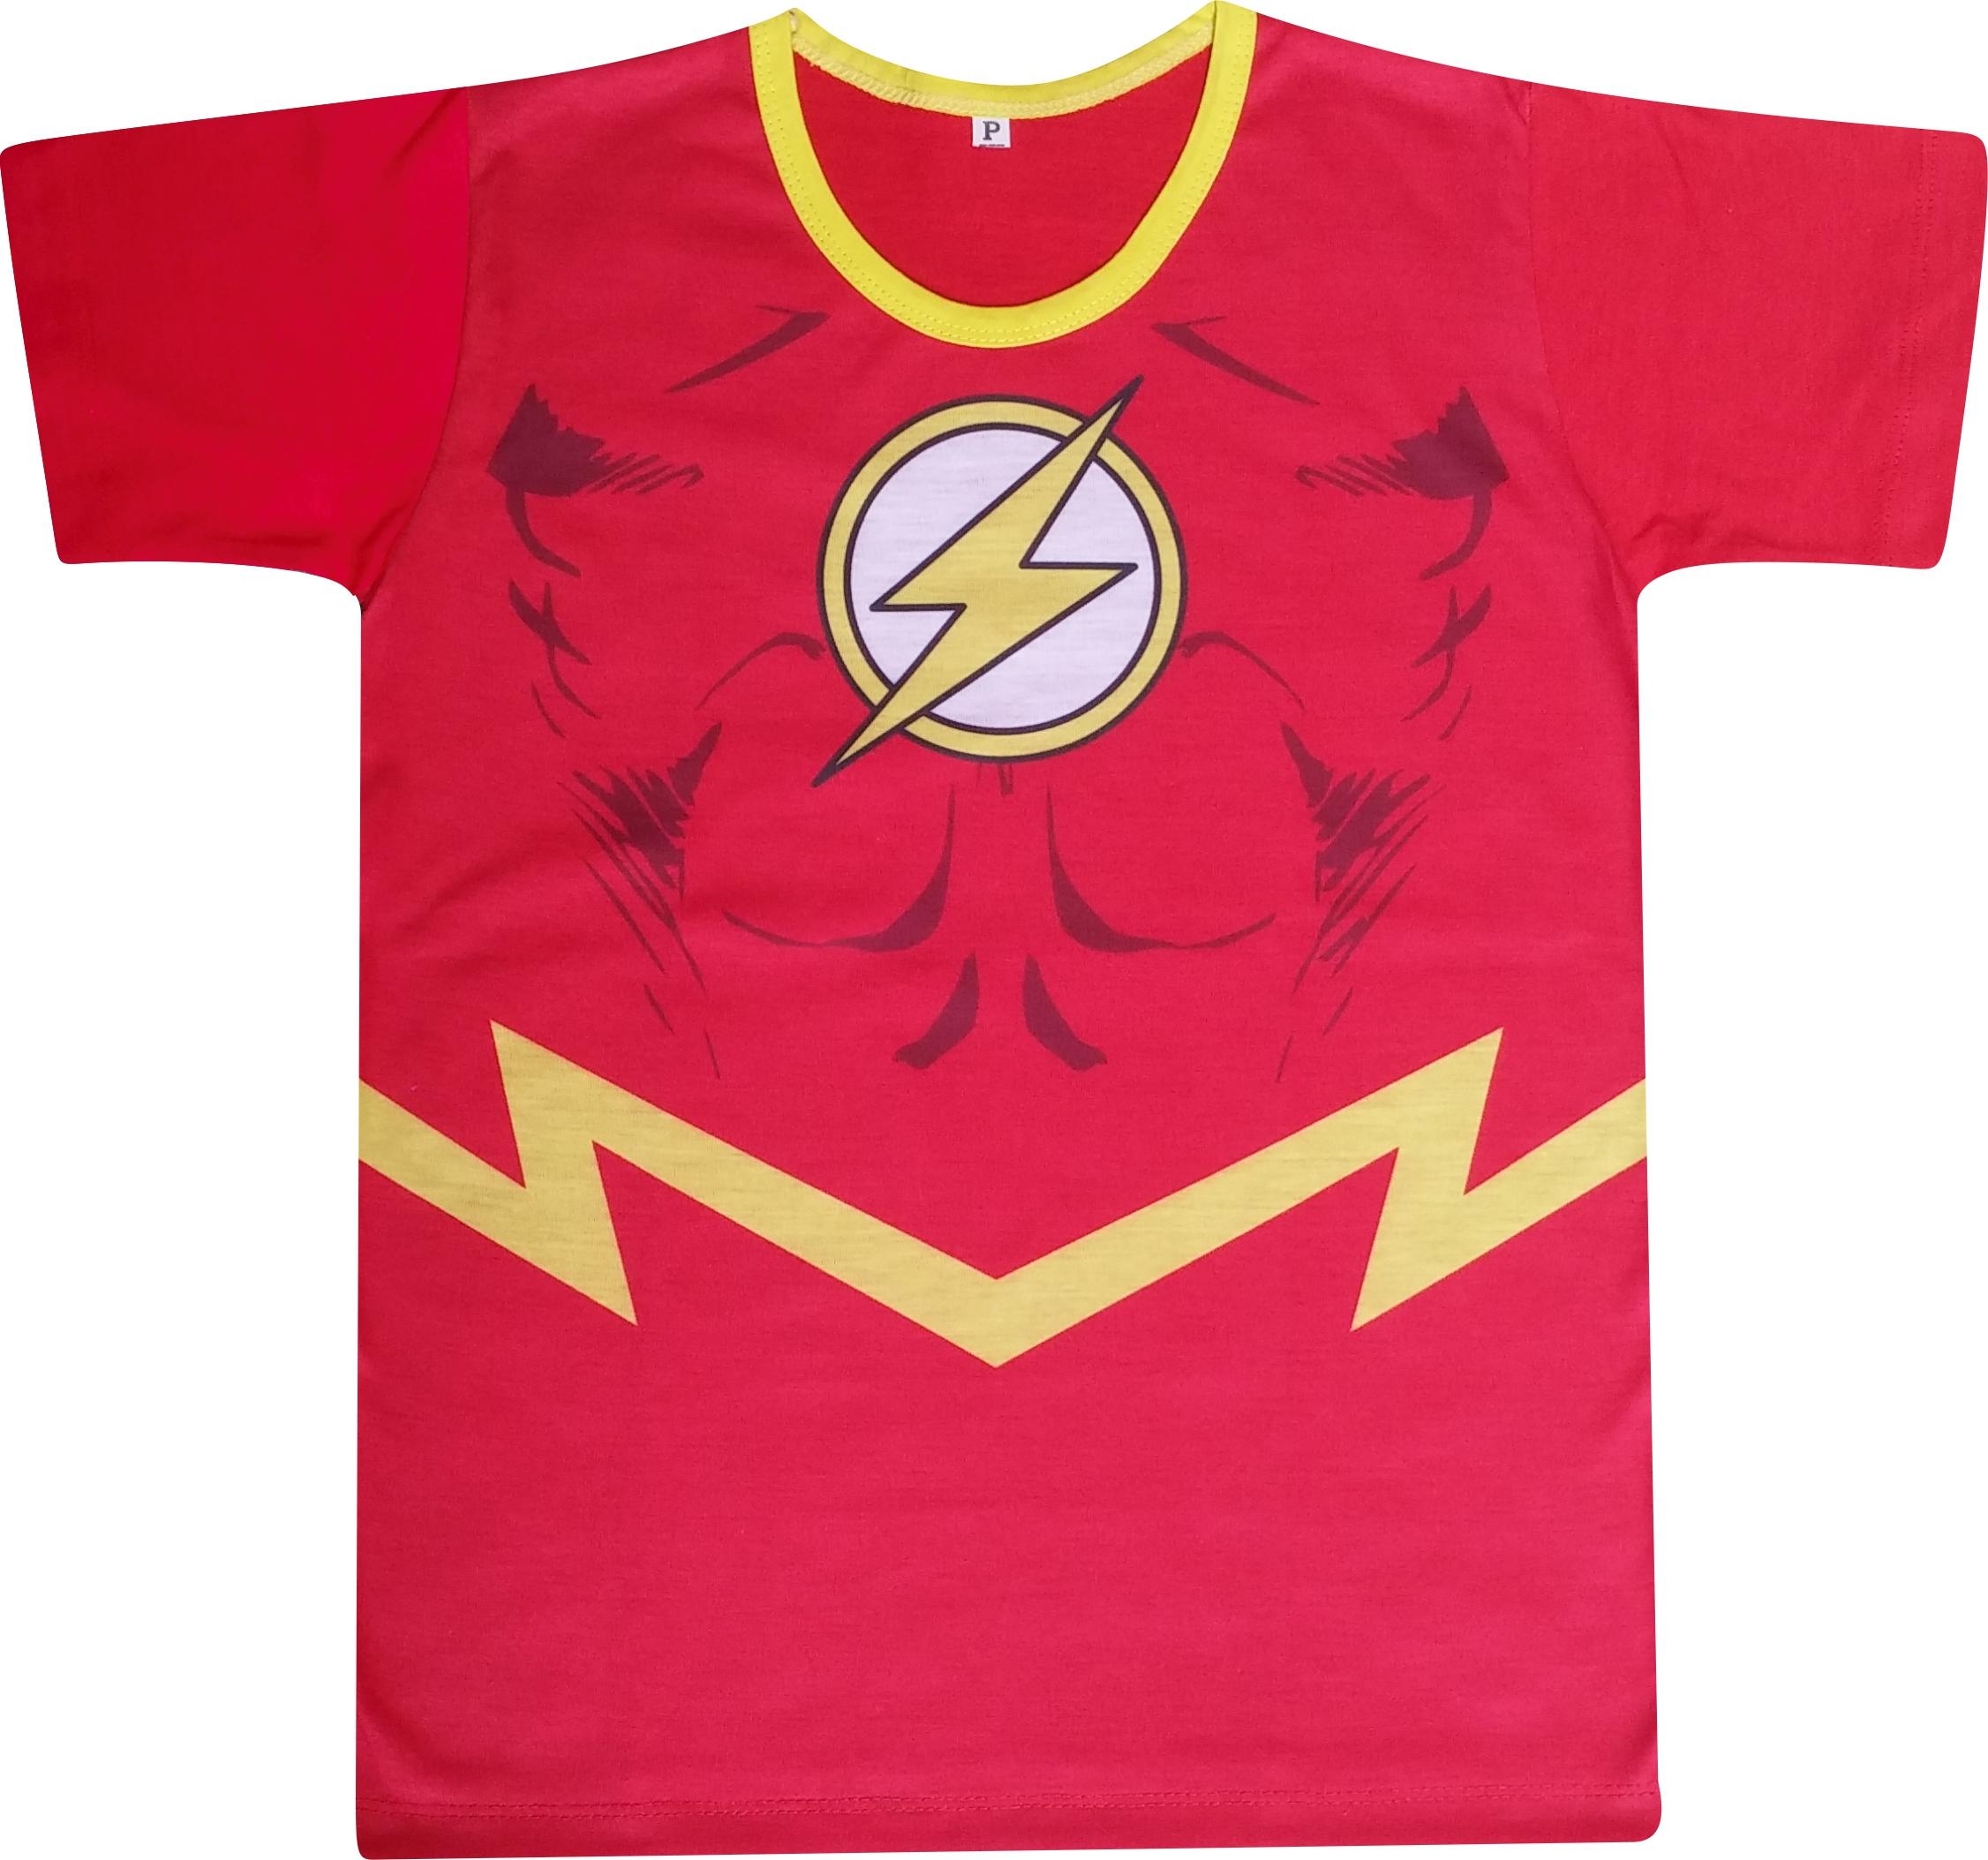 89fb5d6c0f Camiseta Flash Camisa Algodao | Elo7